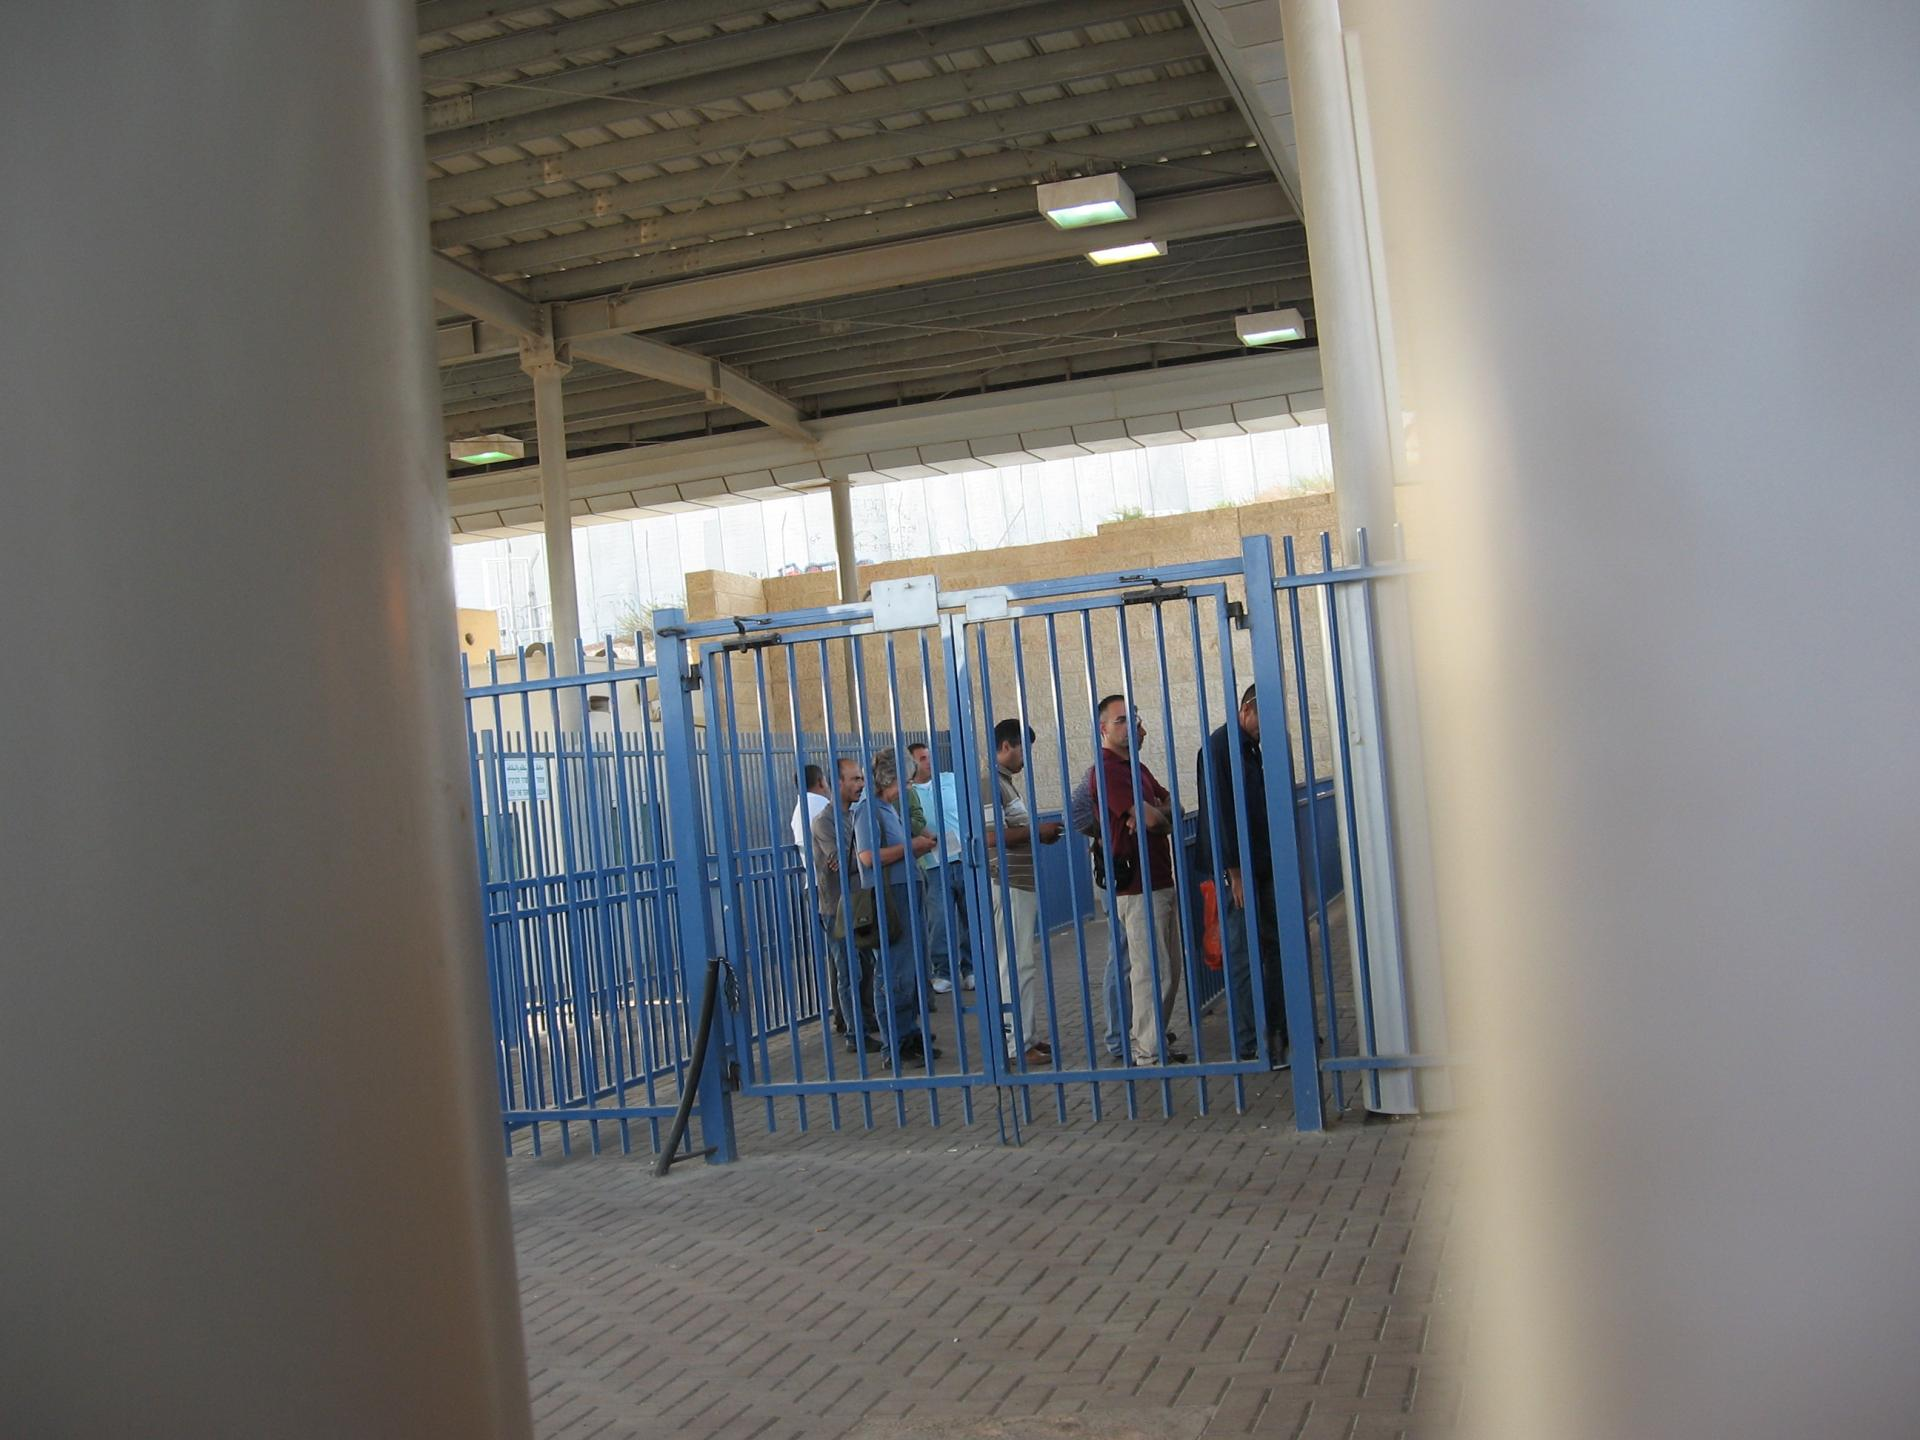 Ras Abu Sbeitan/Zeitim checkpoint 28.10.10